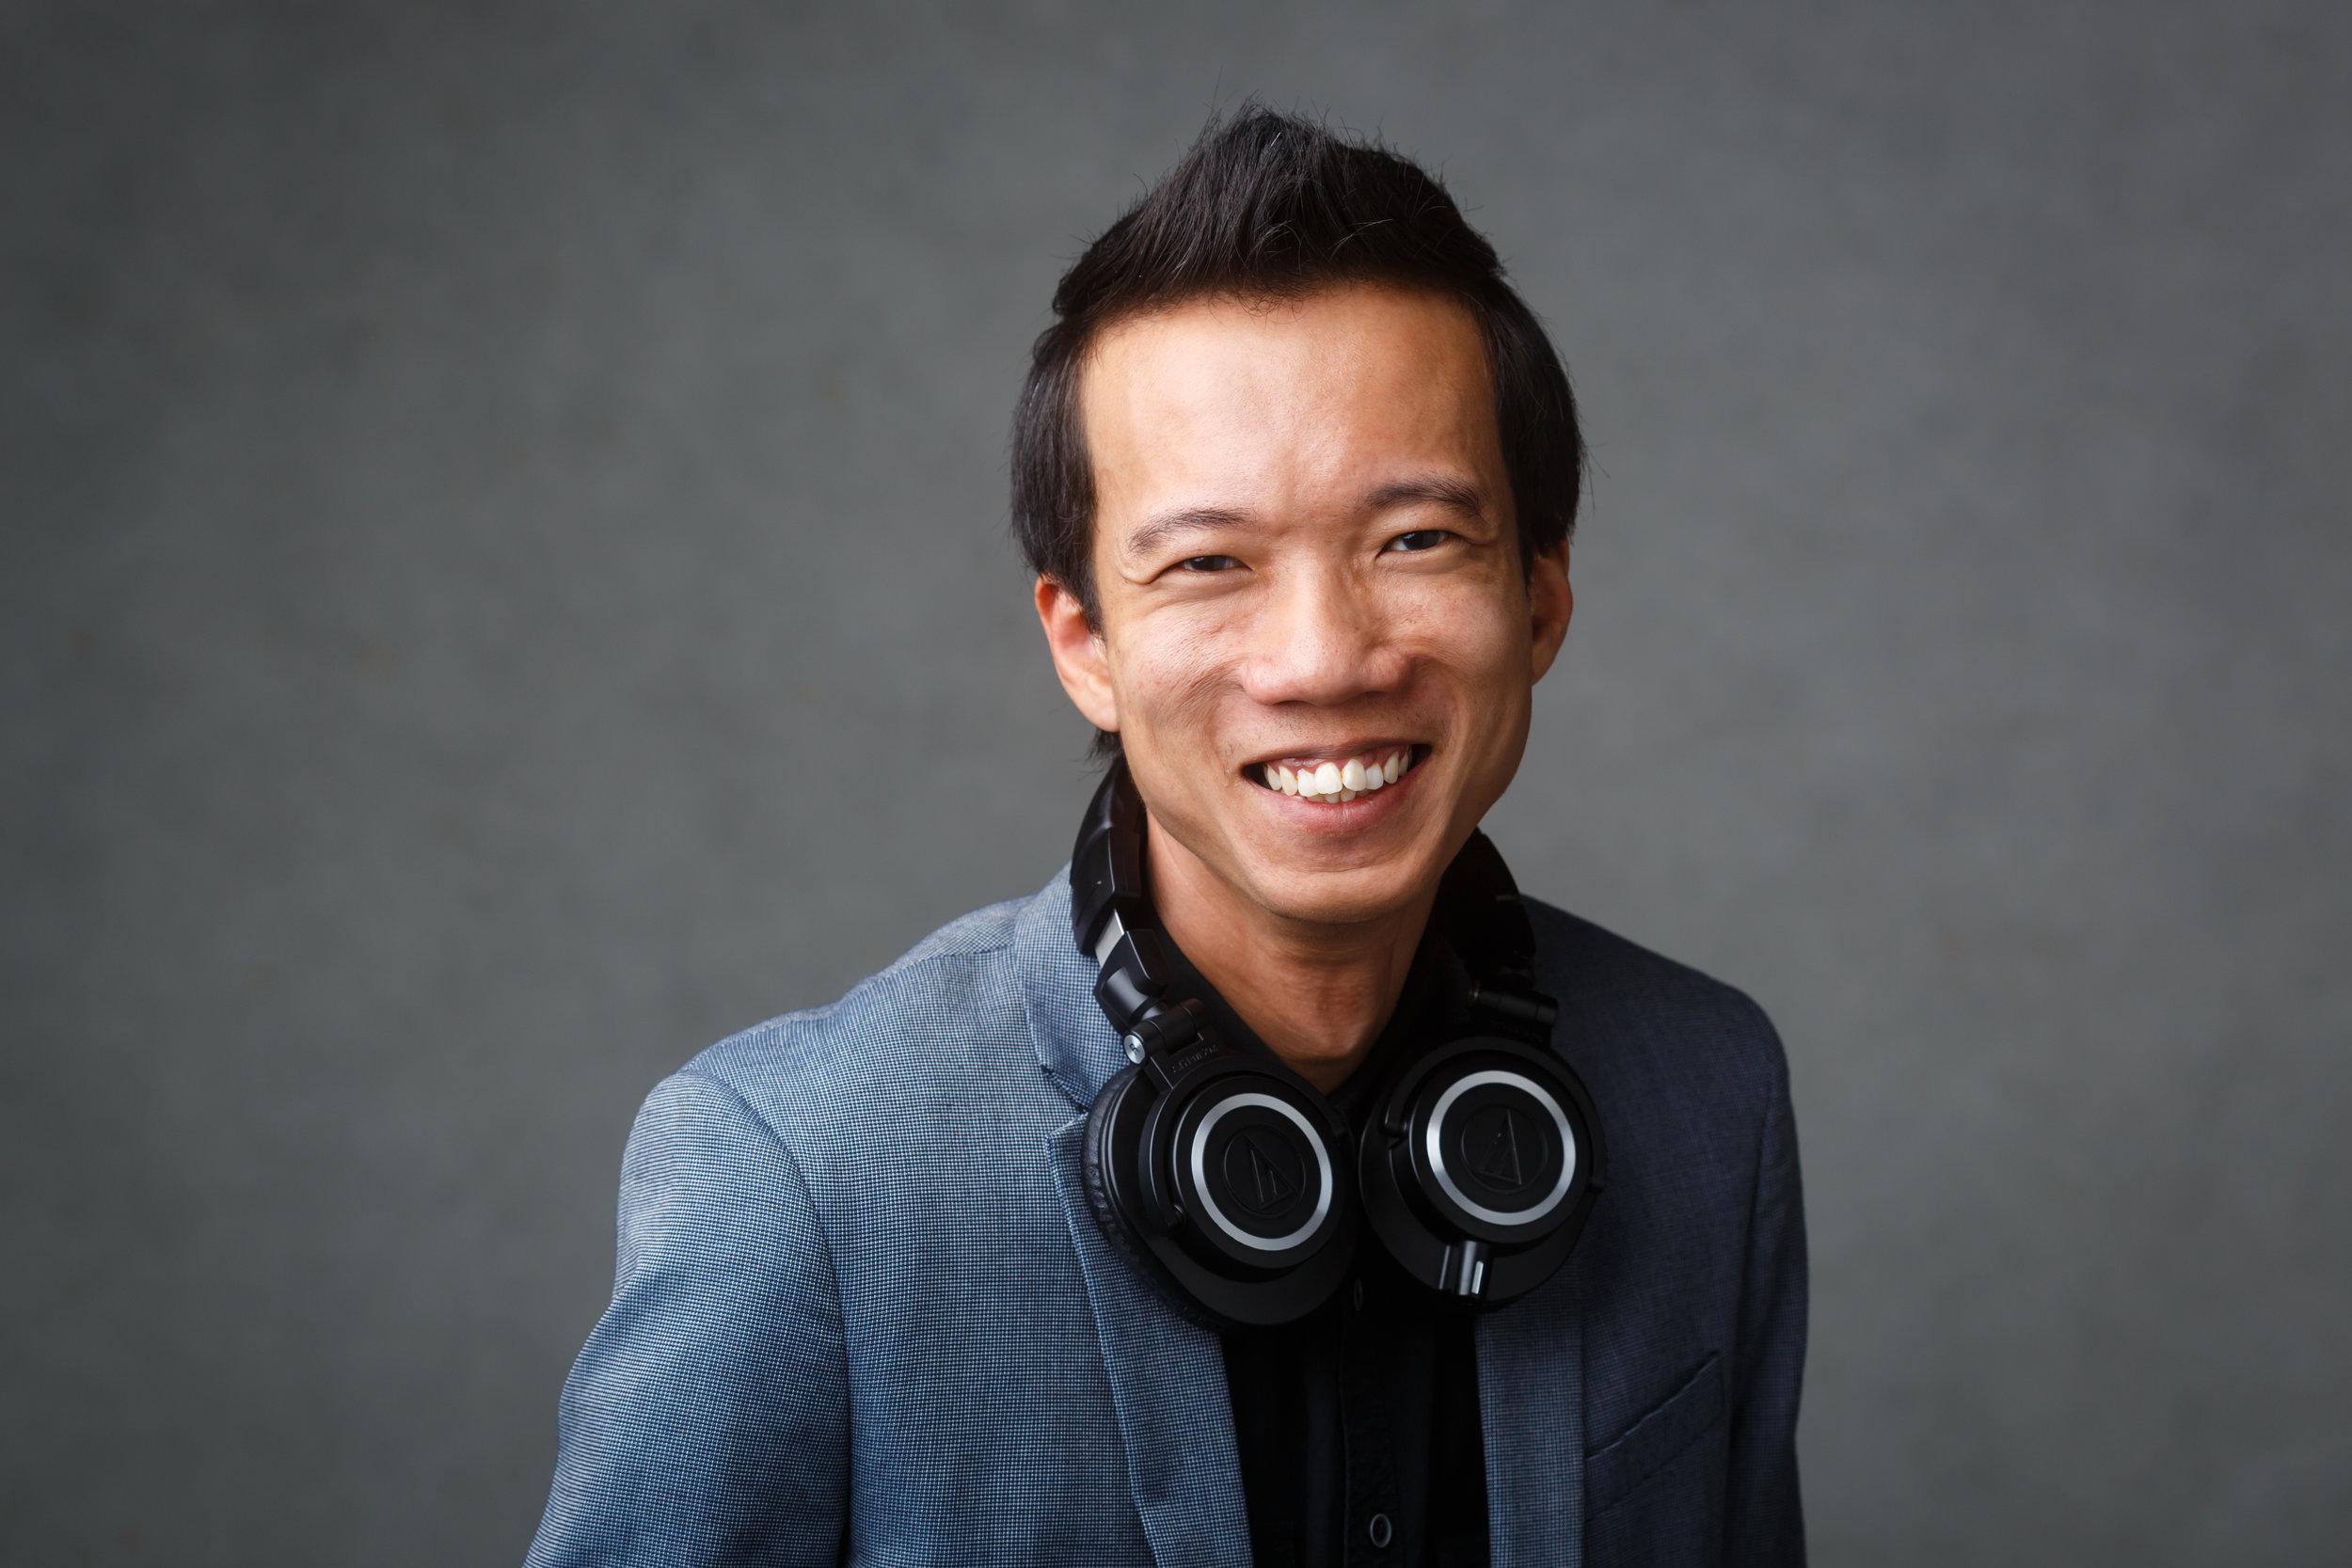 aaron chang - DJ / Emcee / Host / Communications